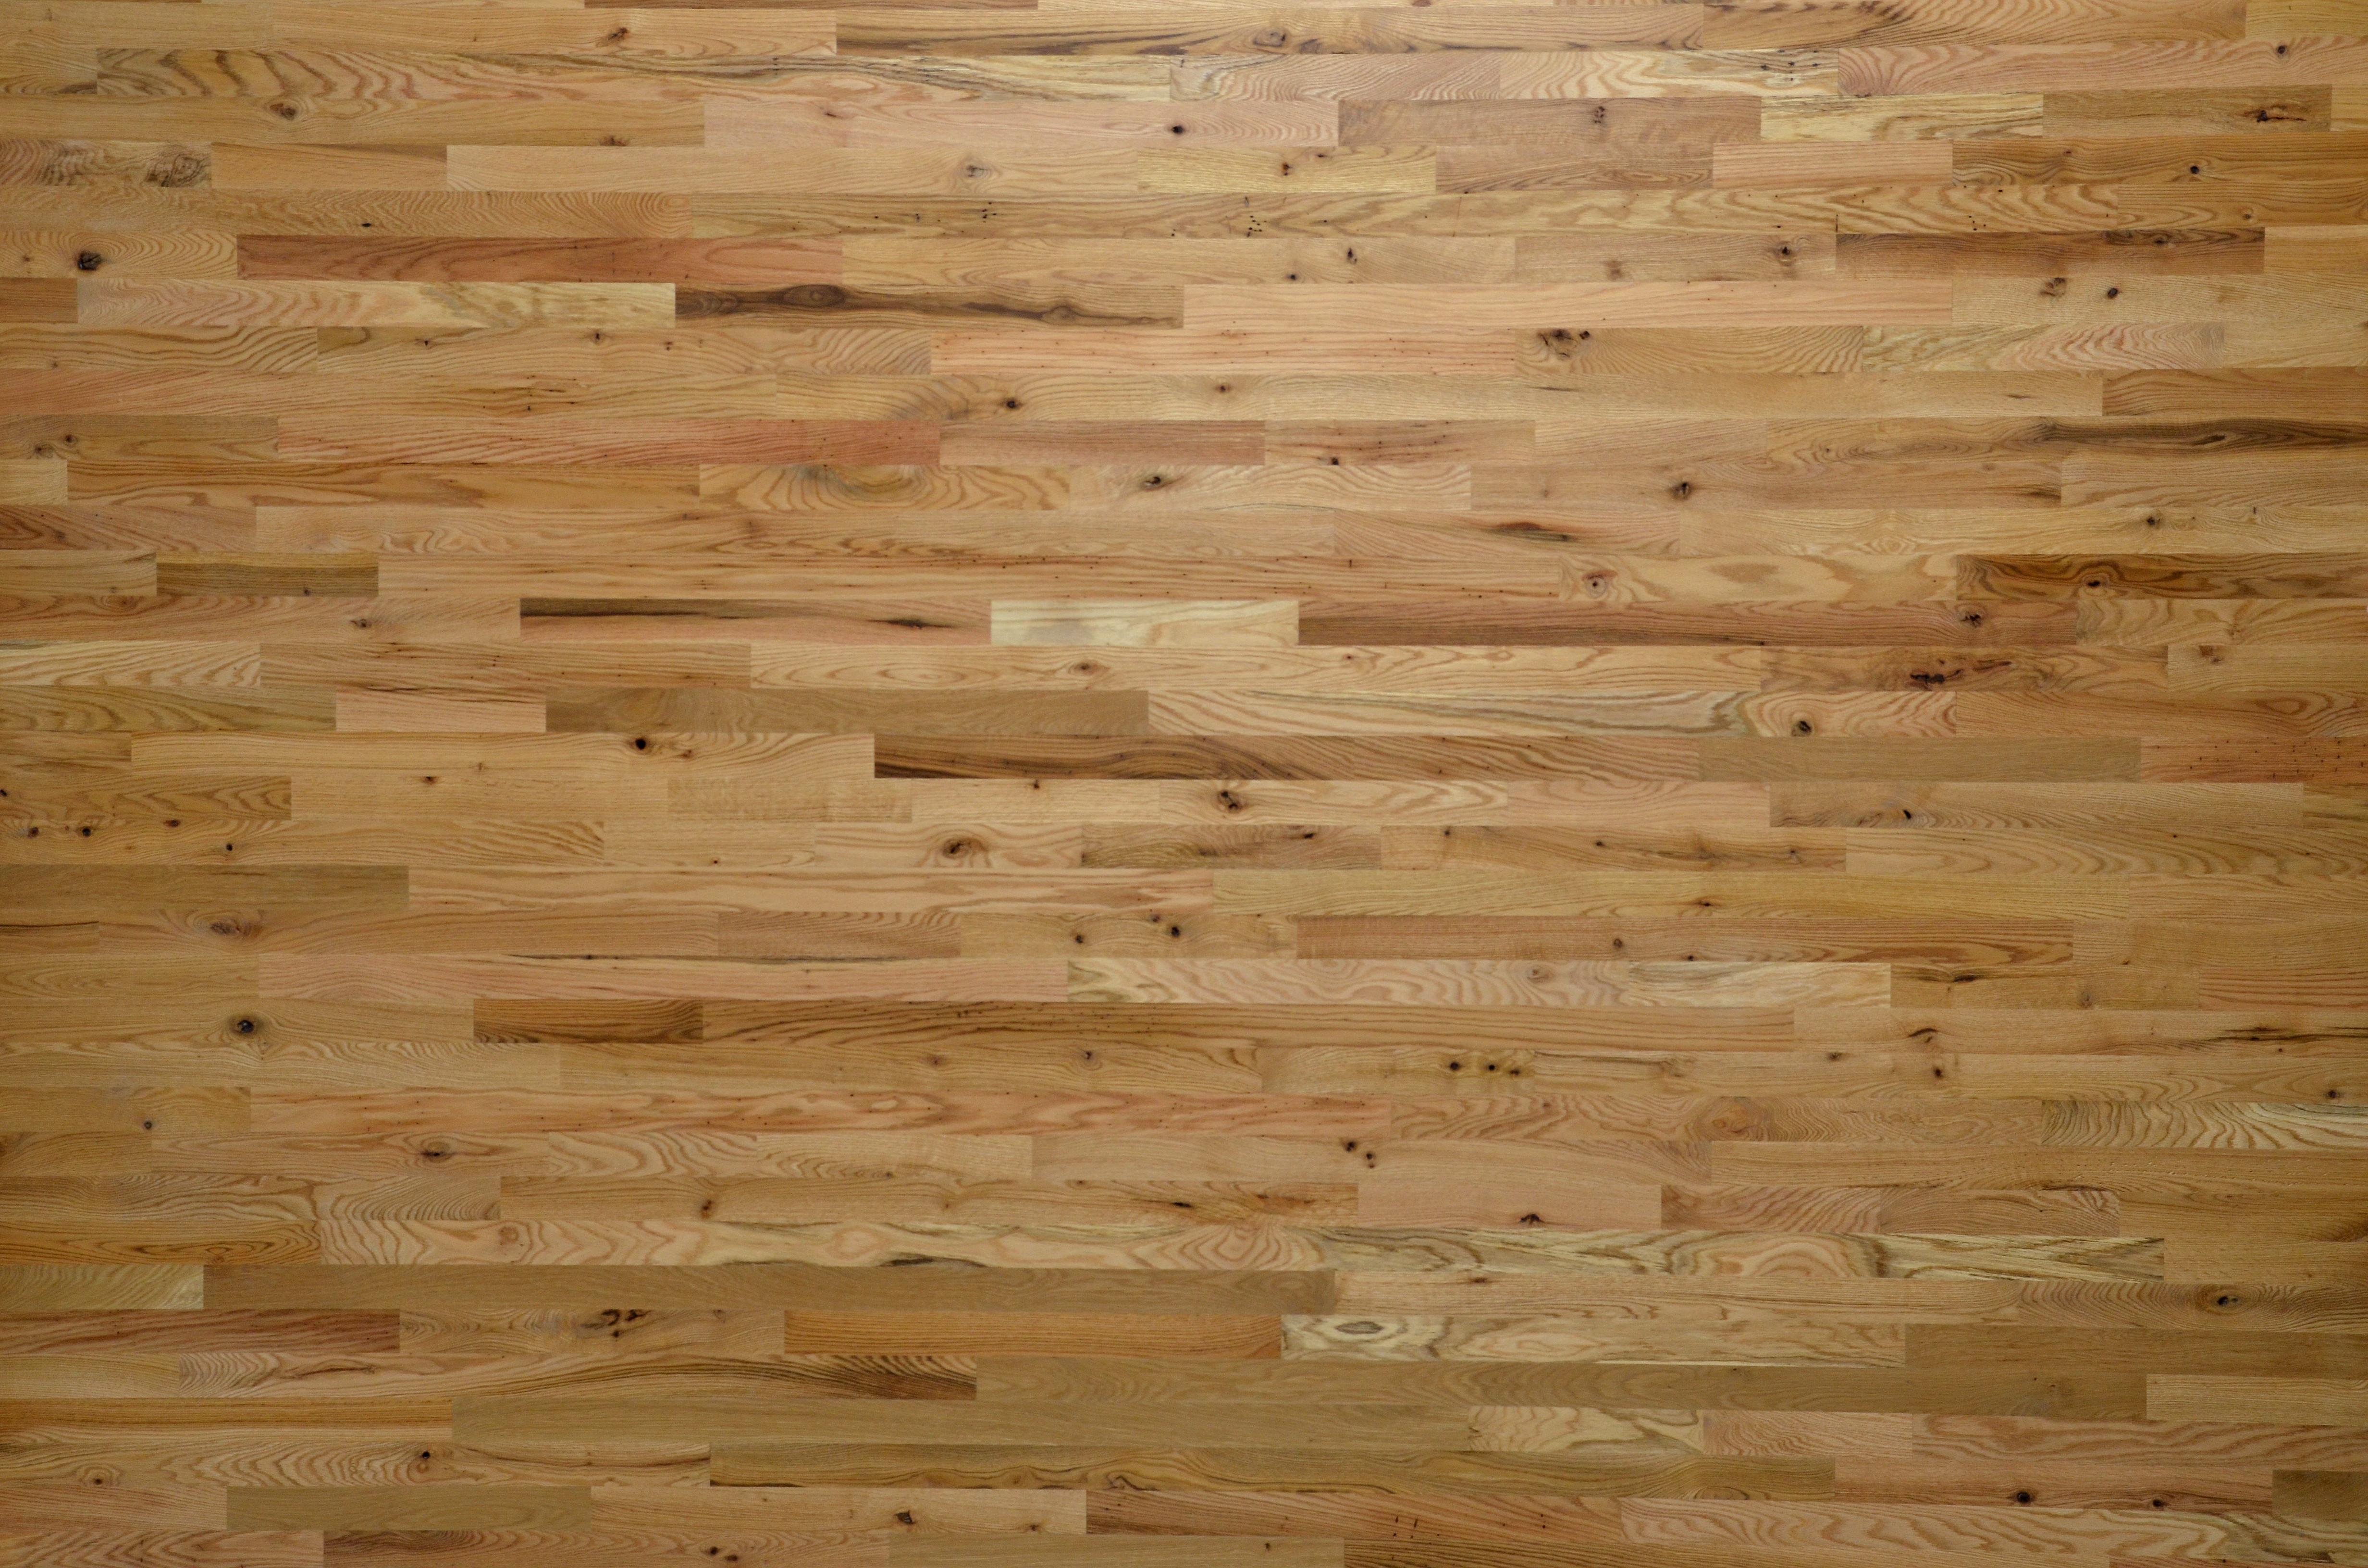 hardwood flooring grading system of lacrosse hardwood flooring walnut white oak red oak hickory in 2 common red oak